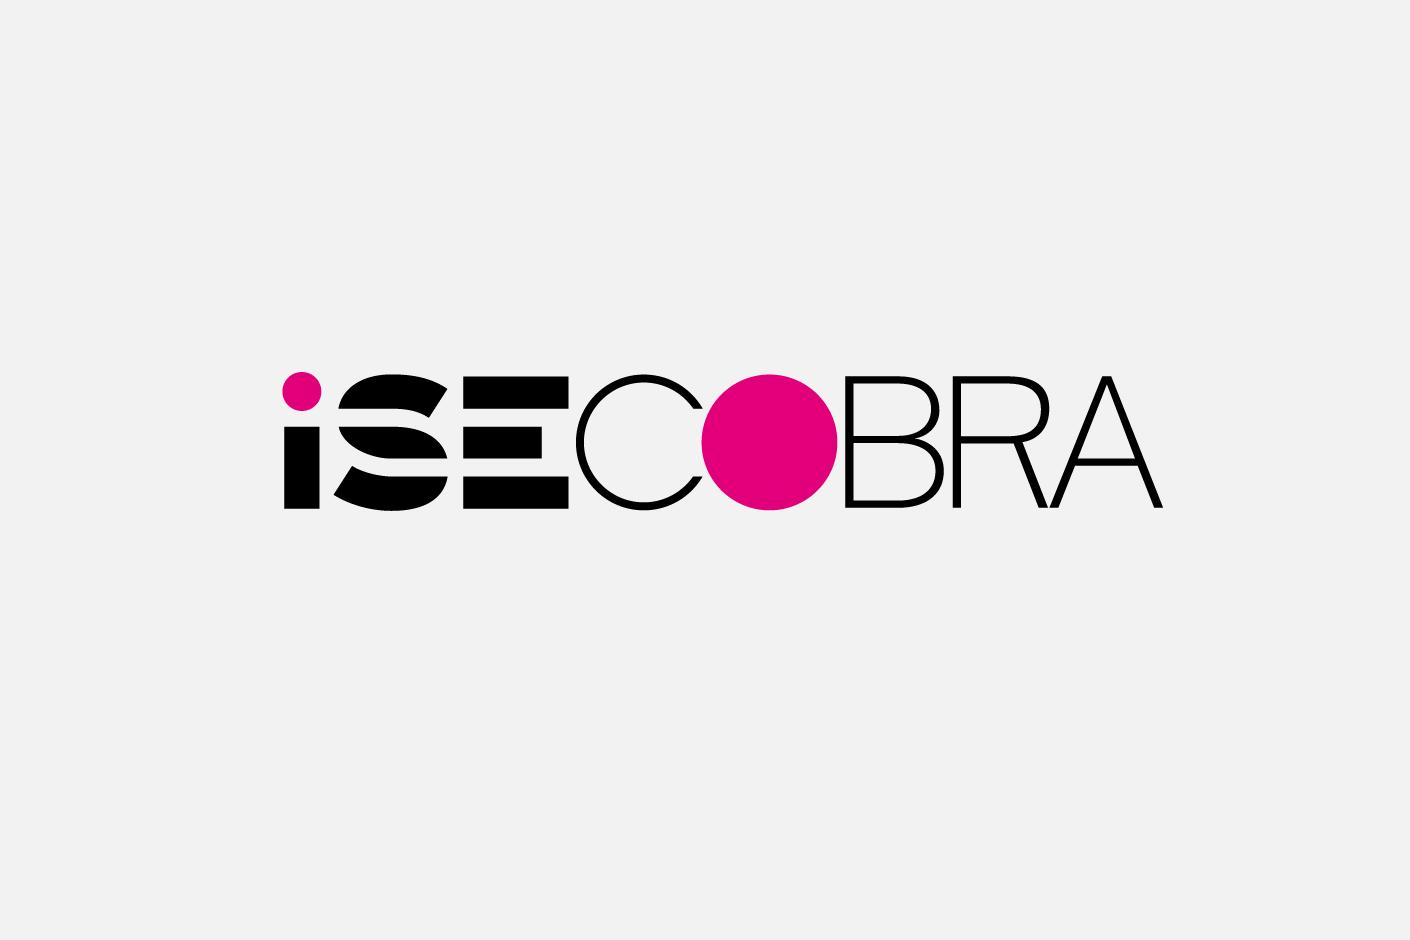 ISE Cobra